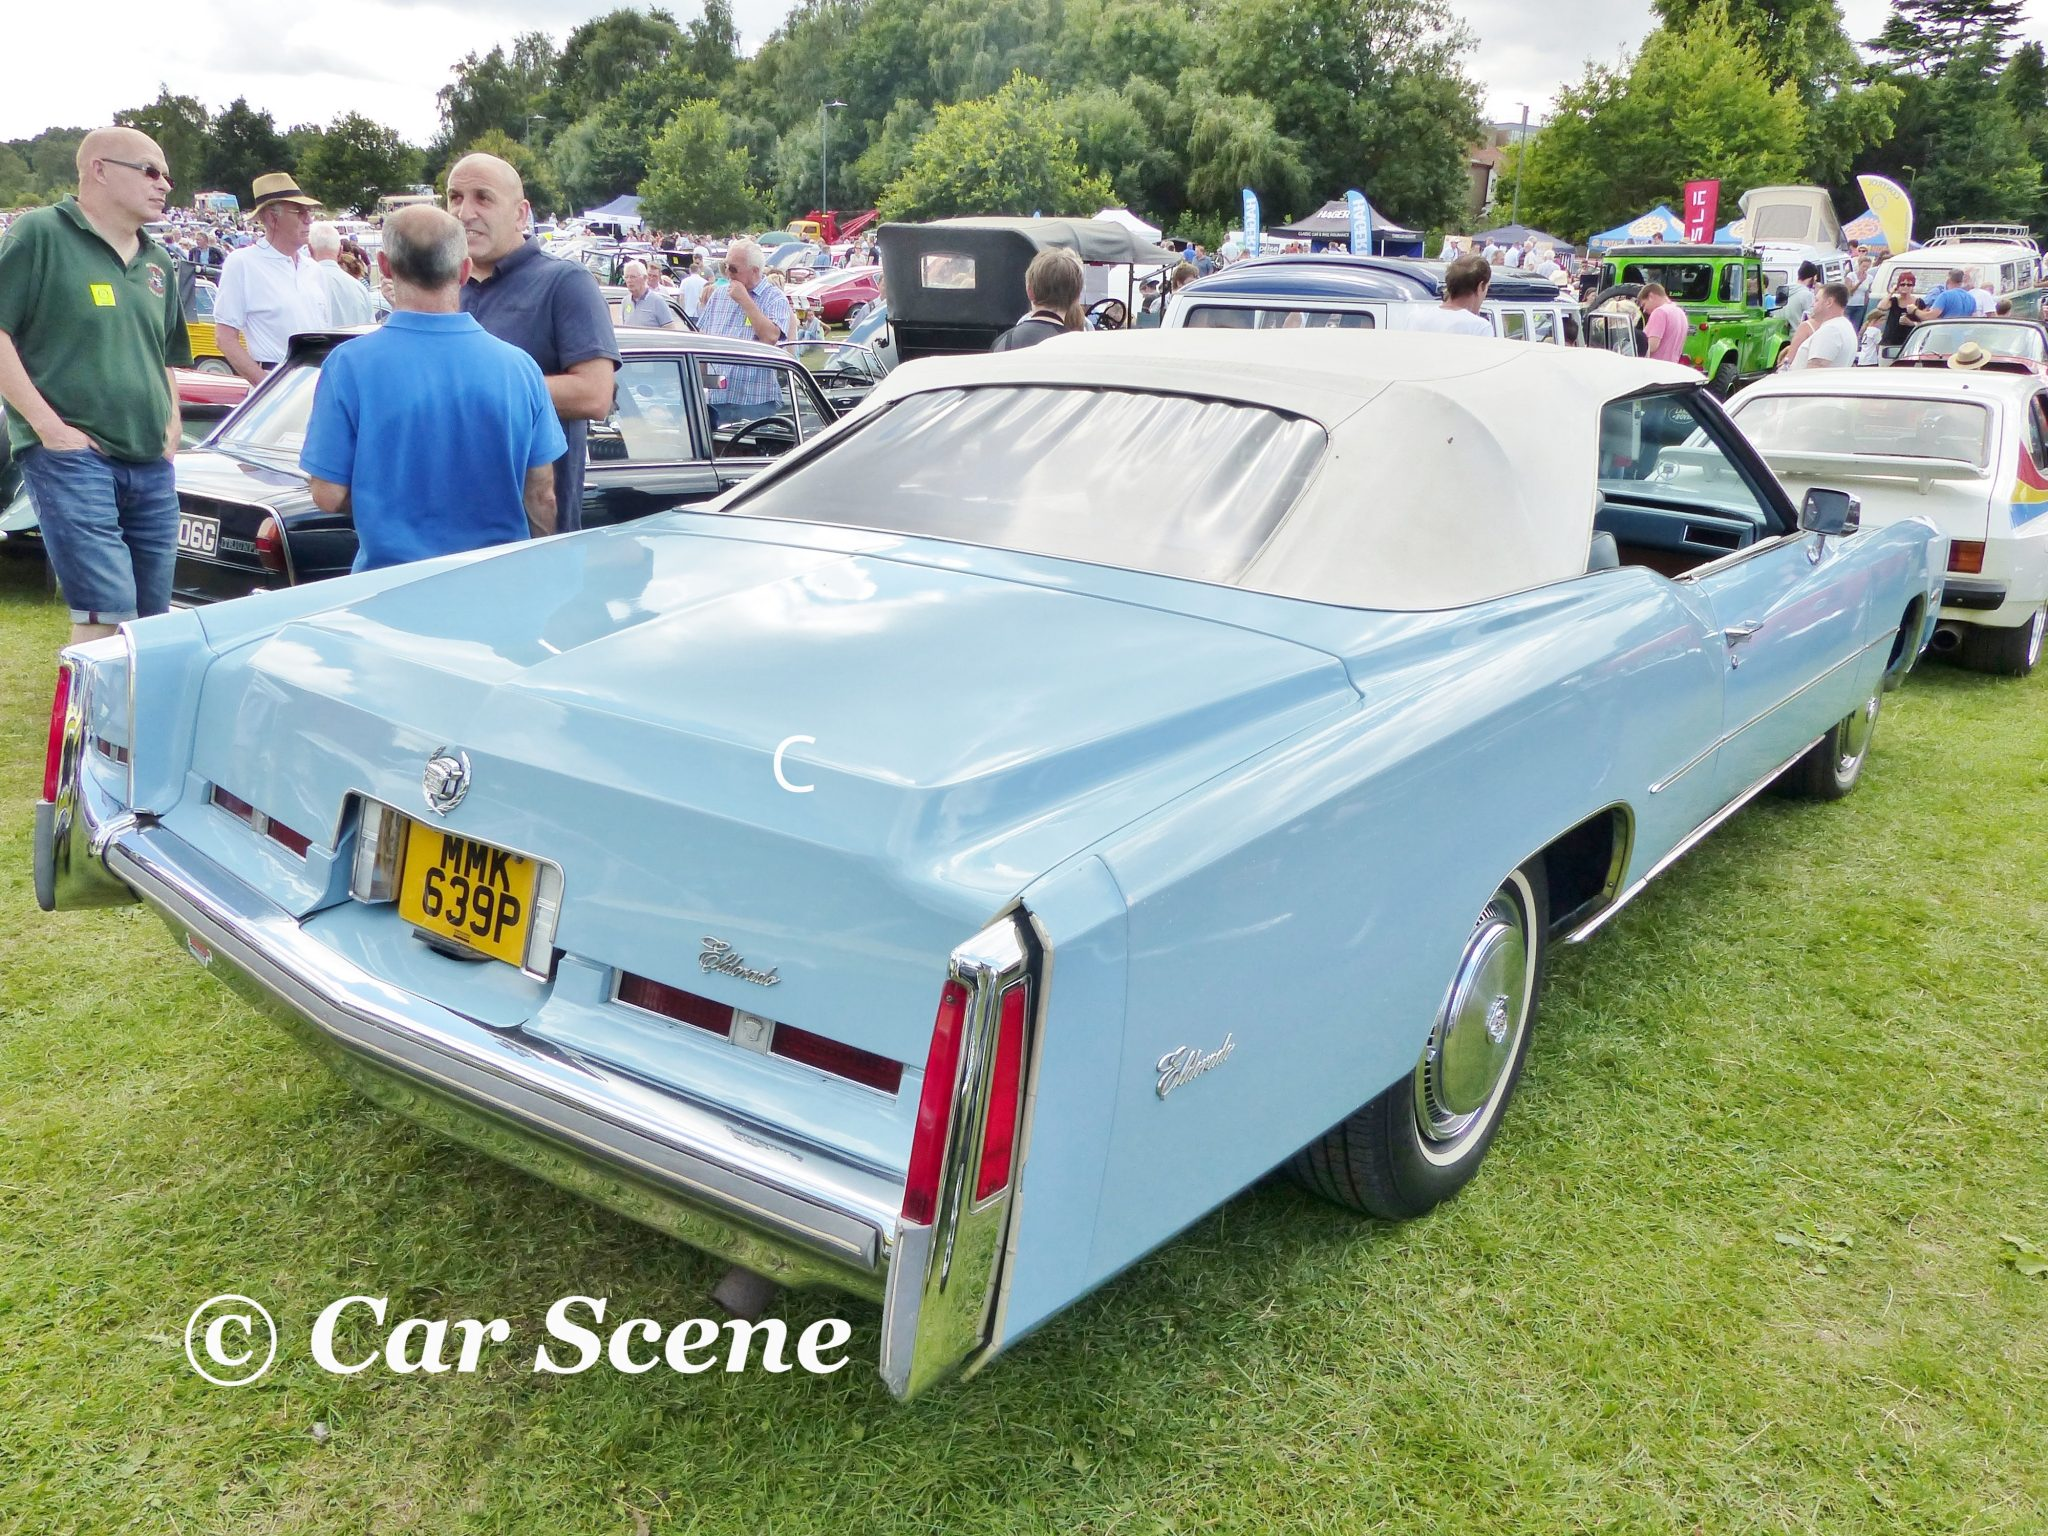 1975 Cadillac Eldorado rear three quarters view